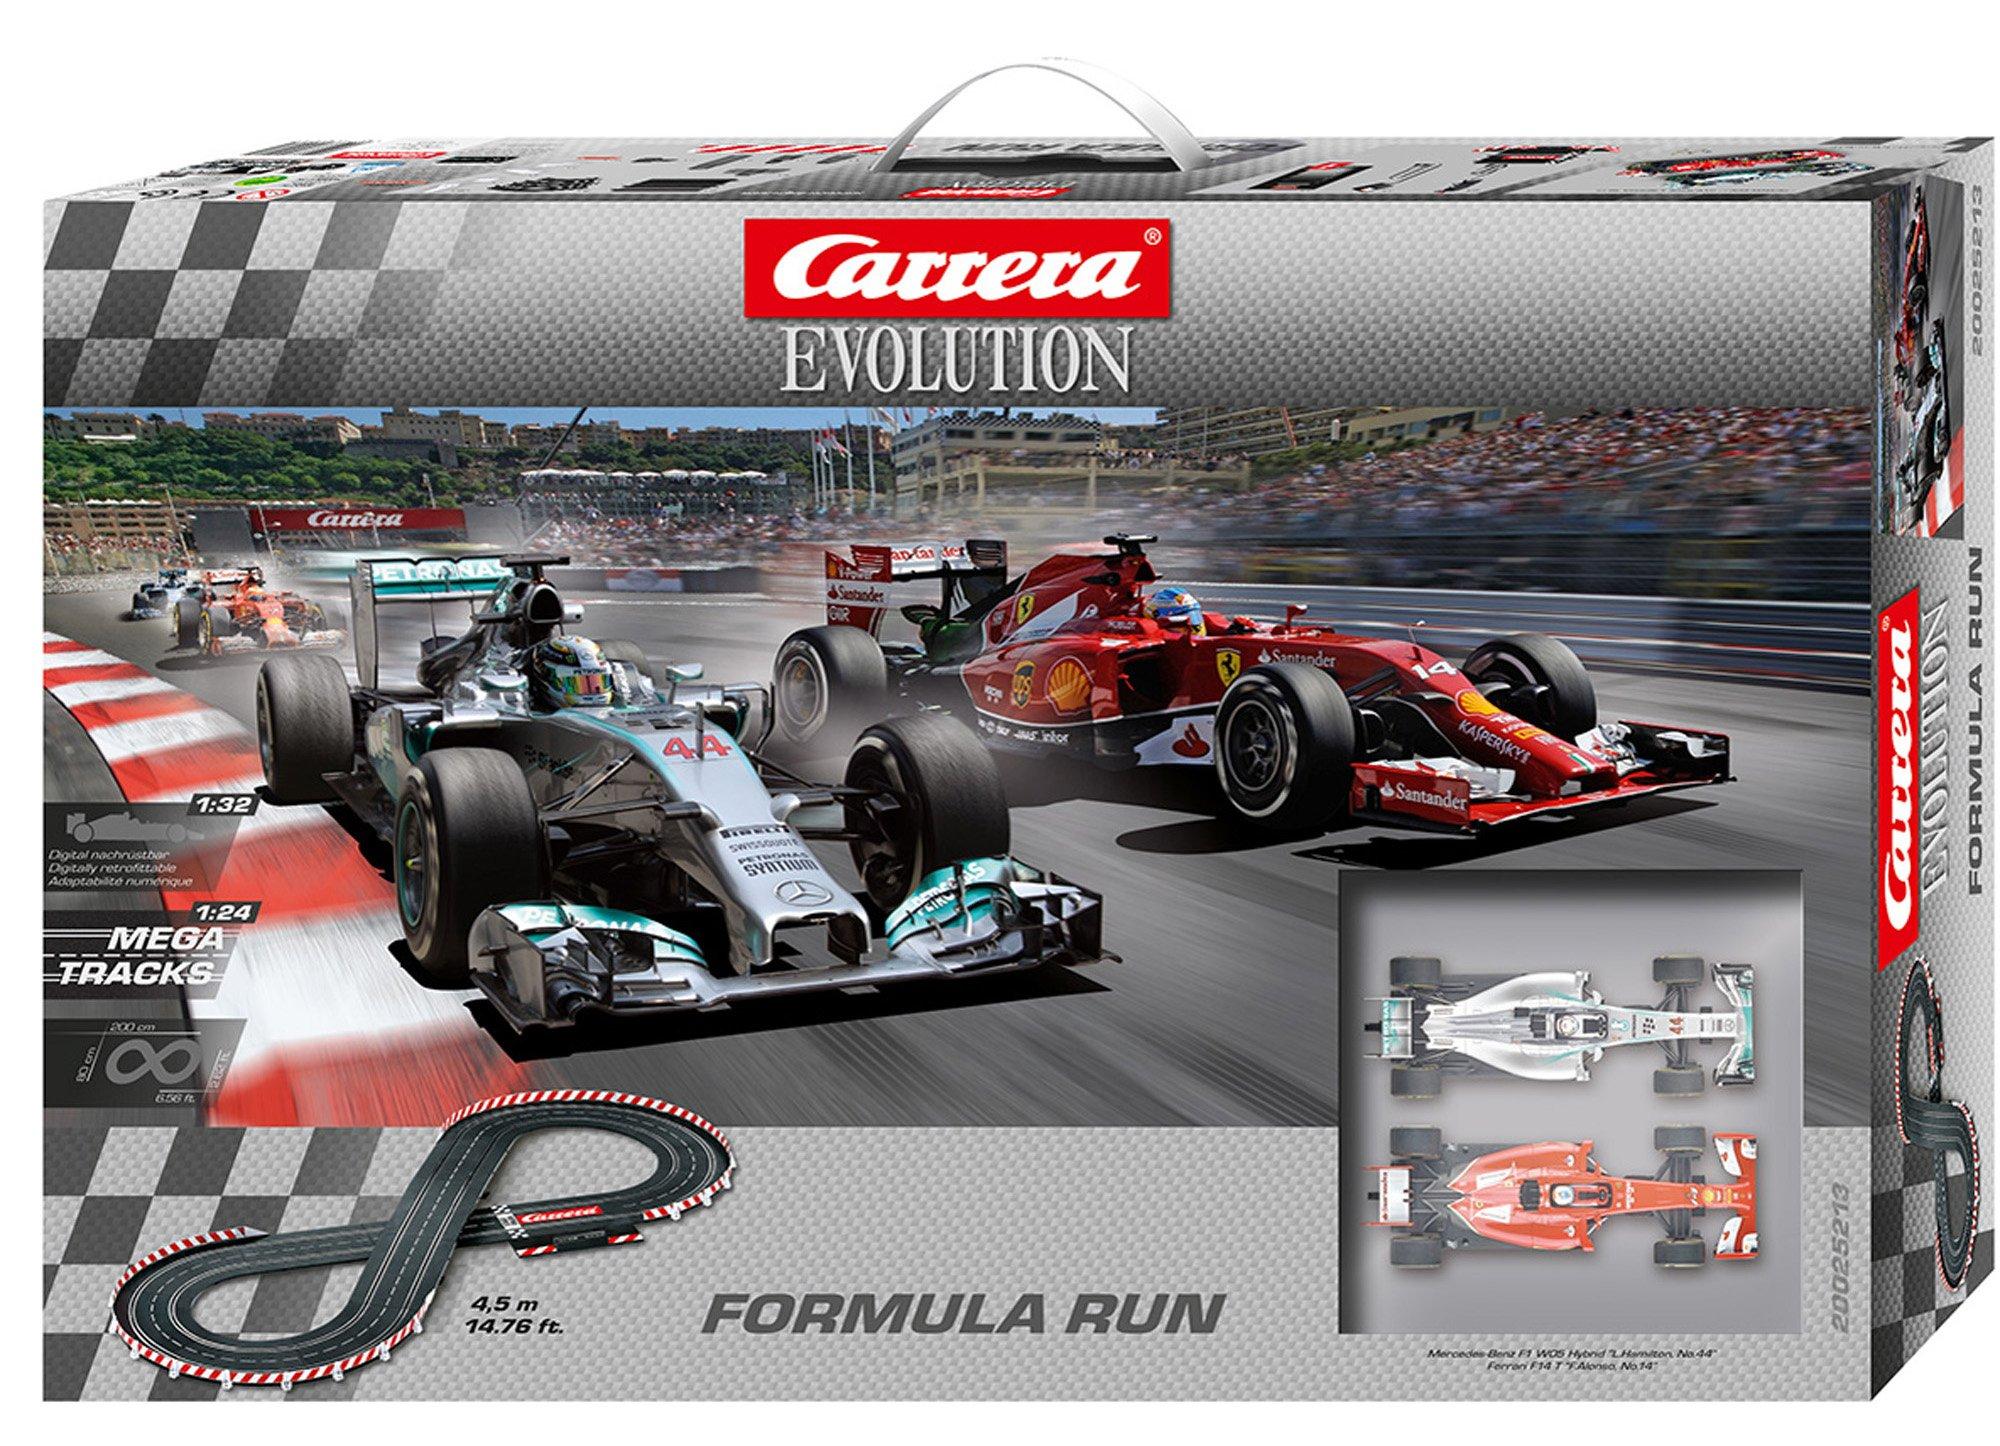 Carrera Evolution - Formula Run Race Set